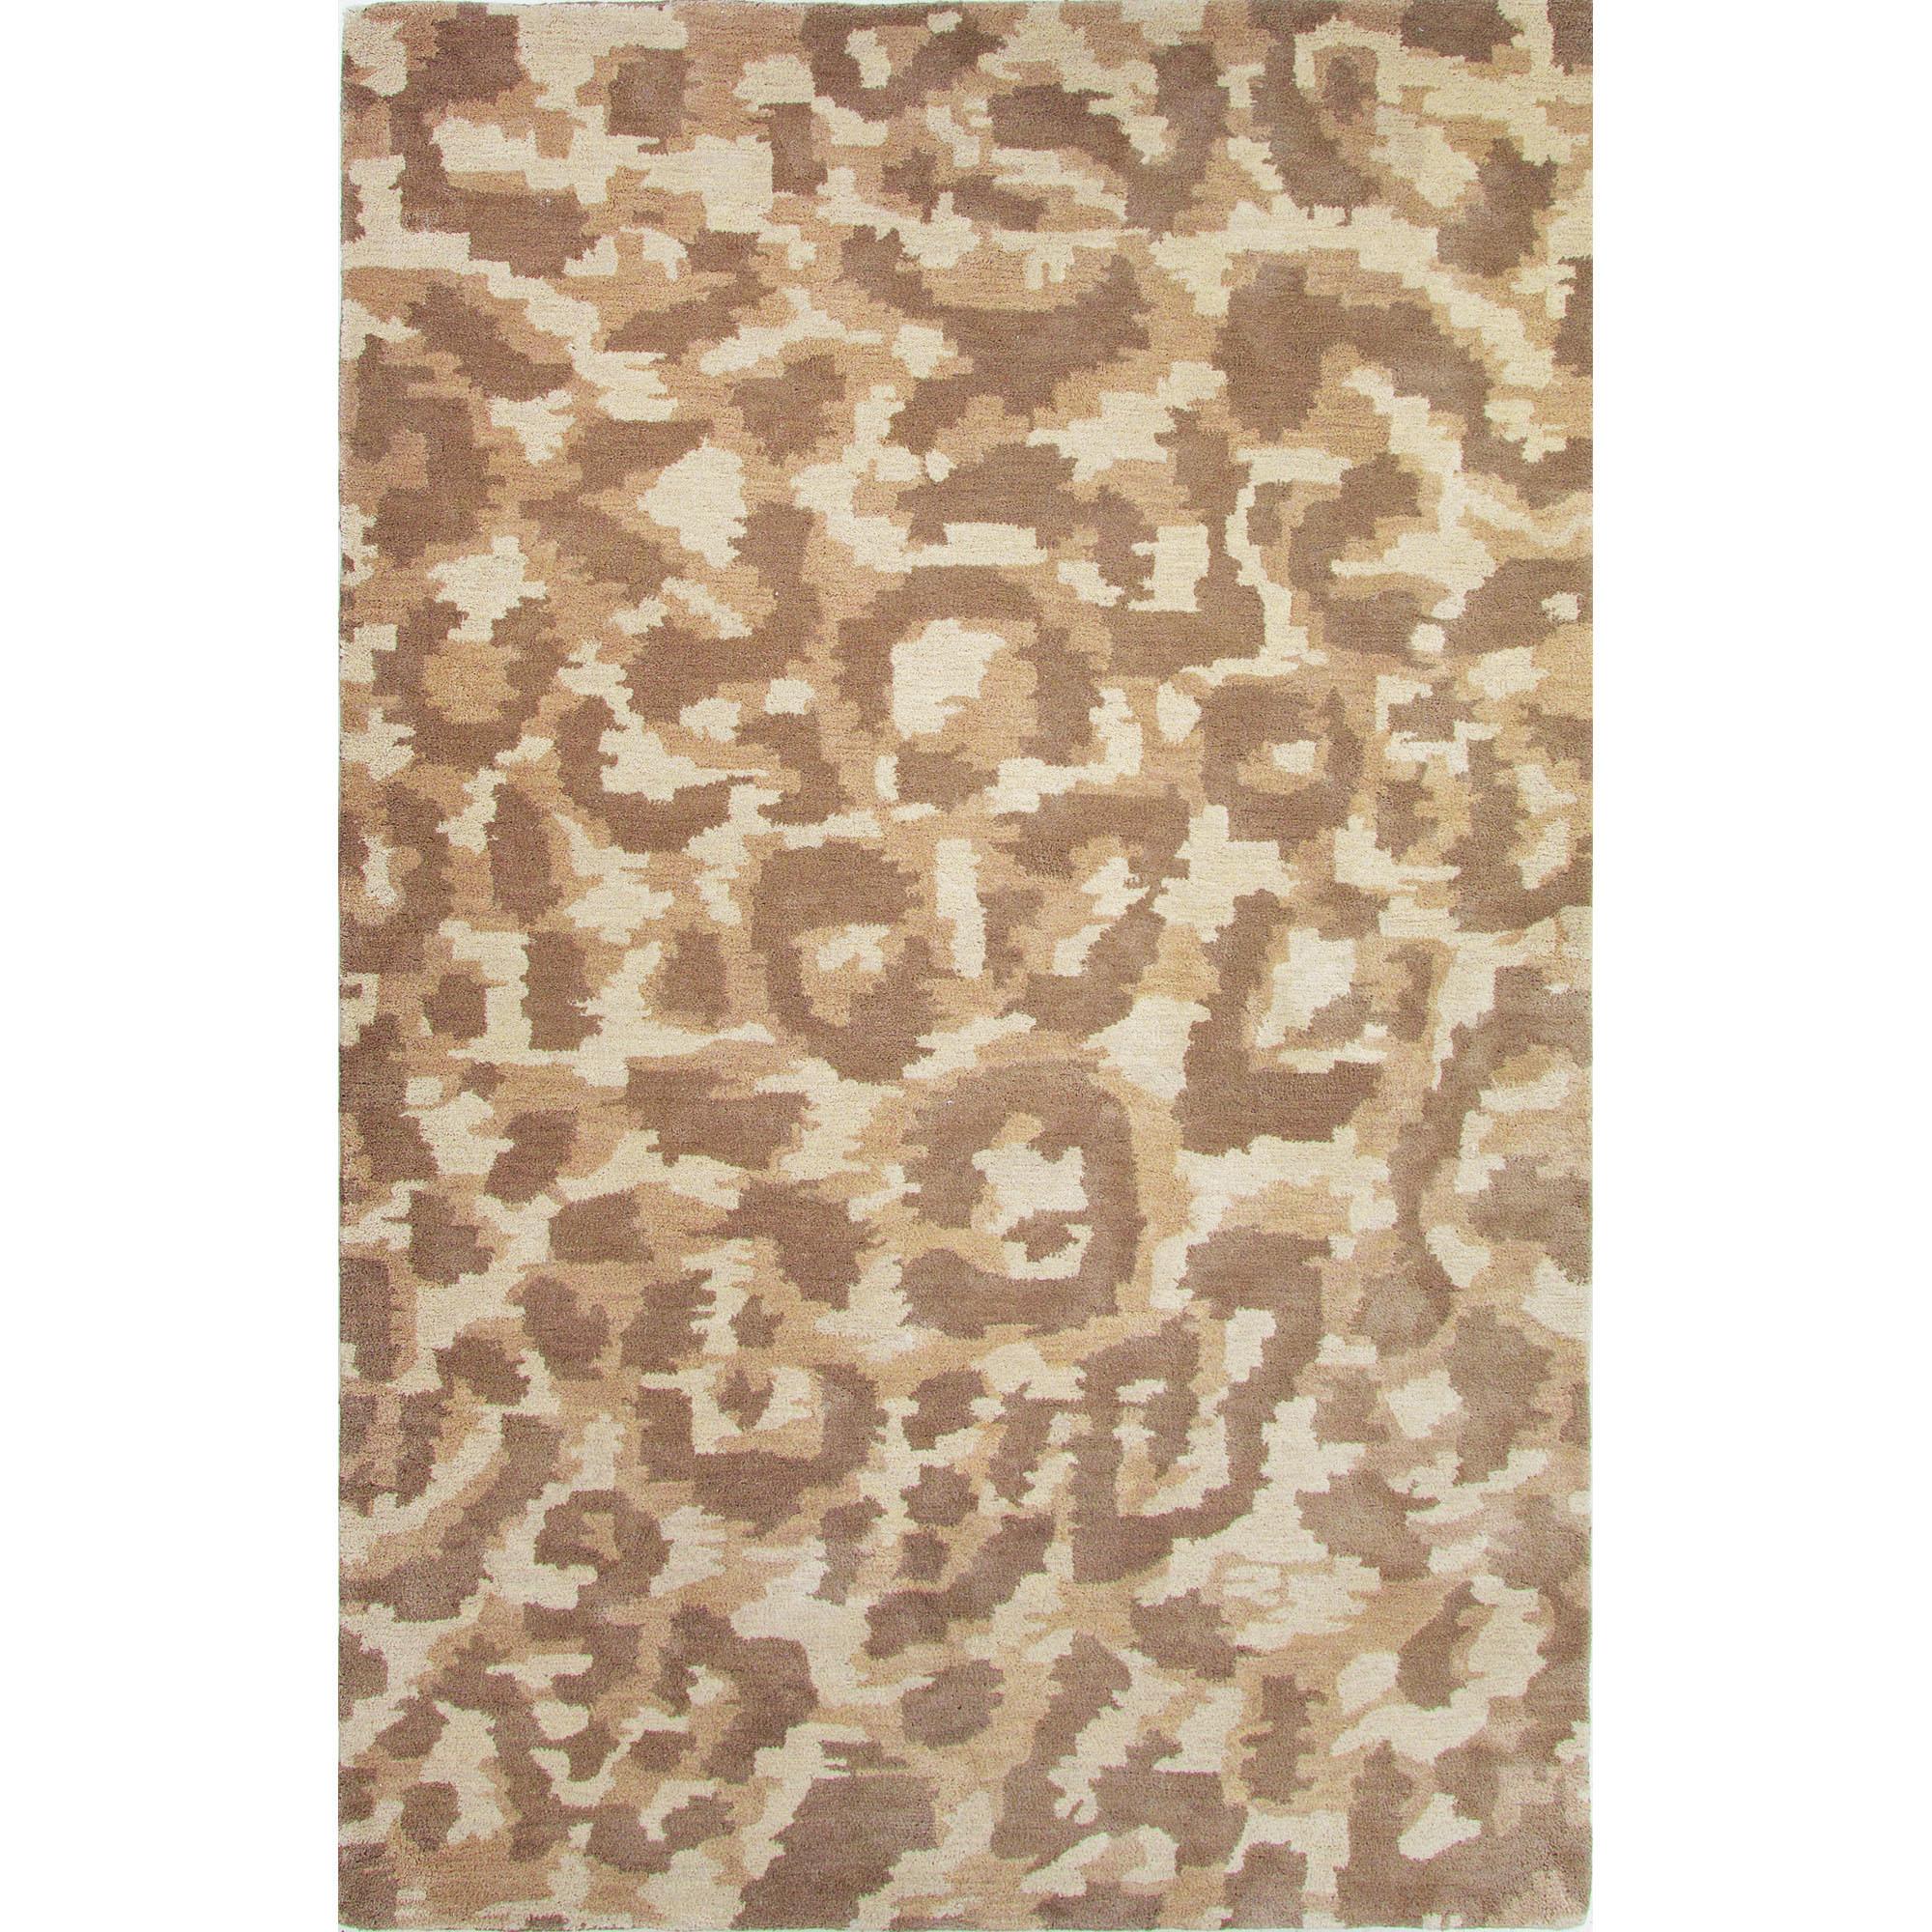 JAIPUR Rugs NatGeo Home Tufted 2 x 3 Rug - Item Number: RUG124999